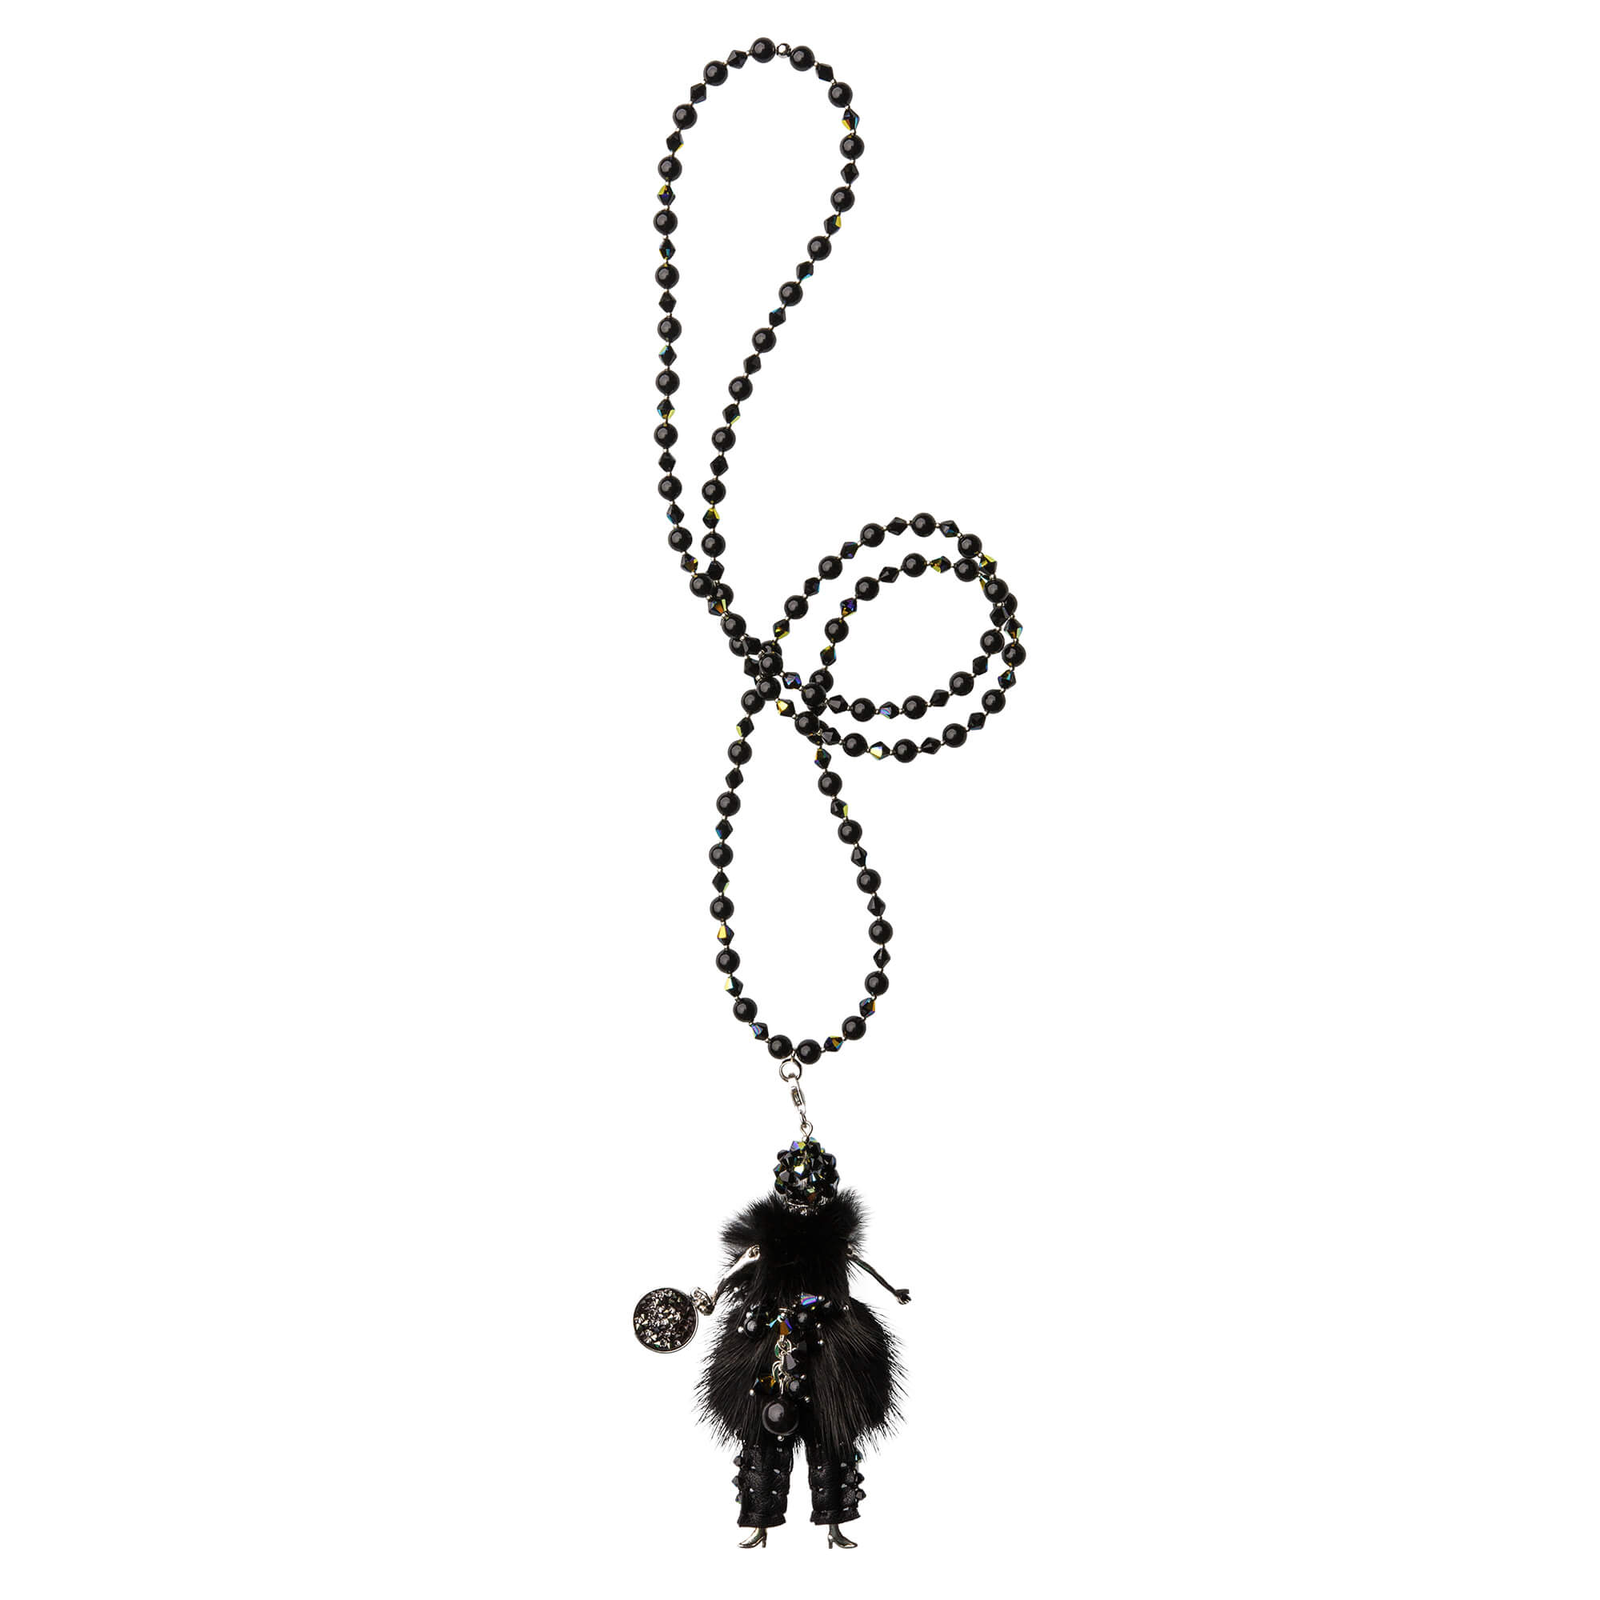 Recenzia na náhrdelník Garciela a náušnice Noemi